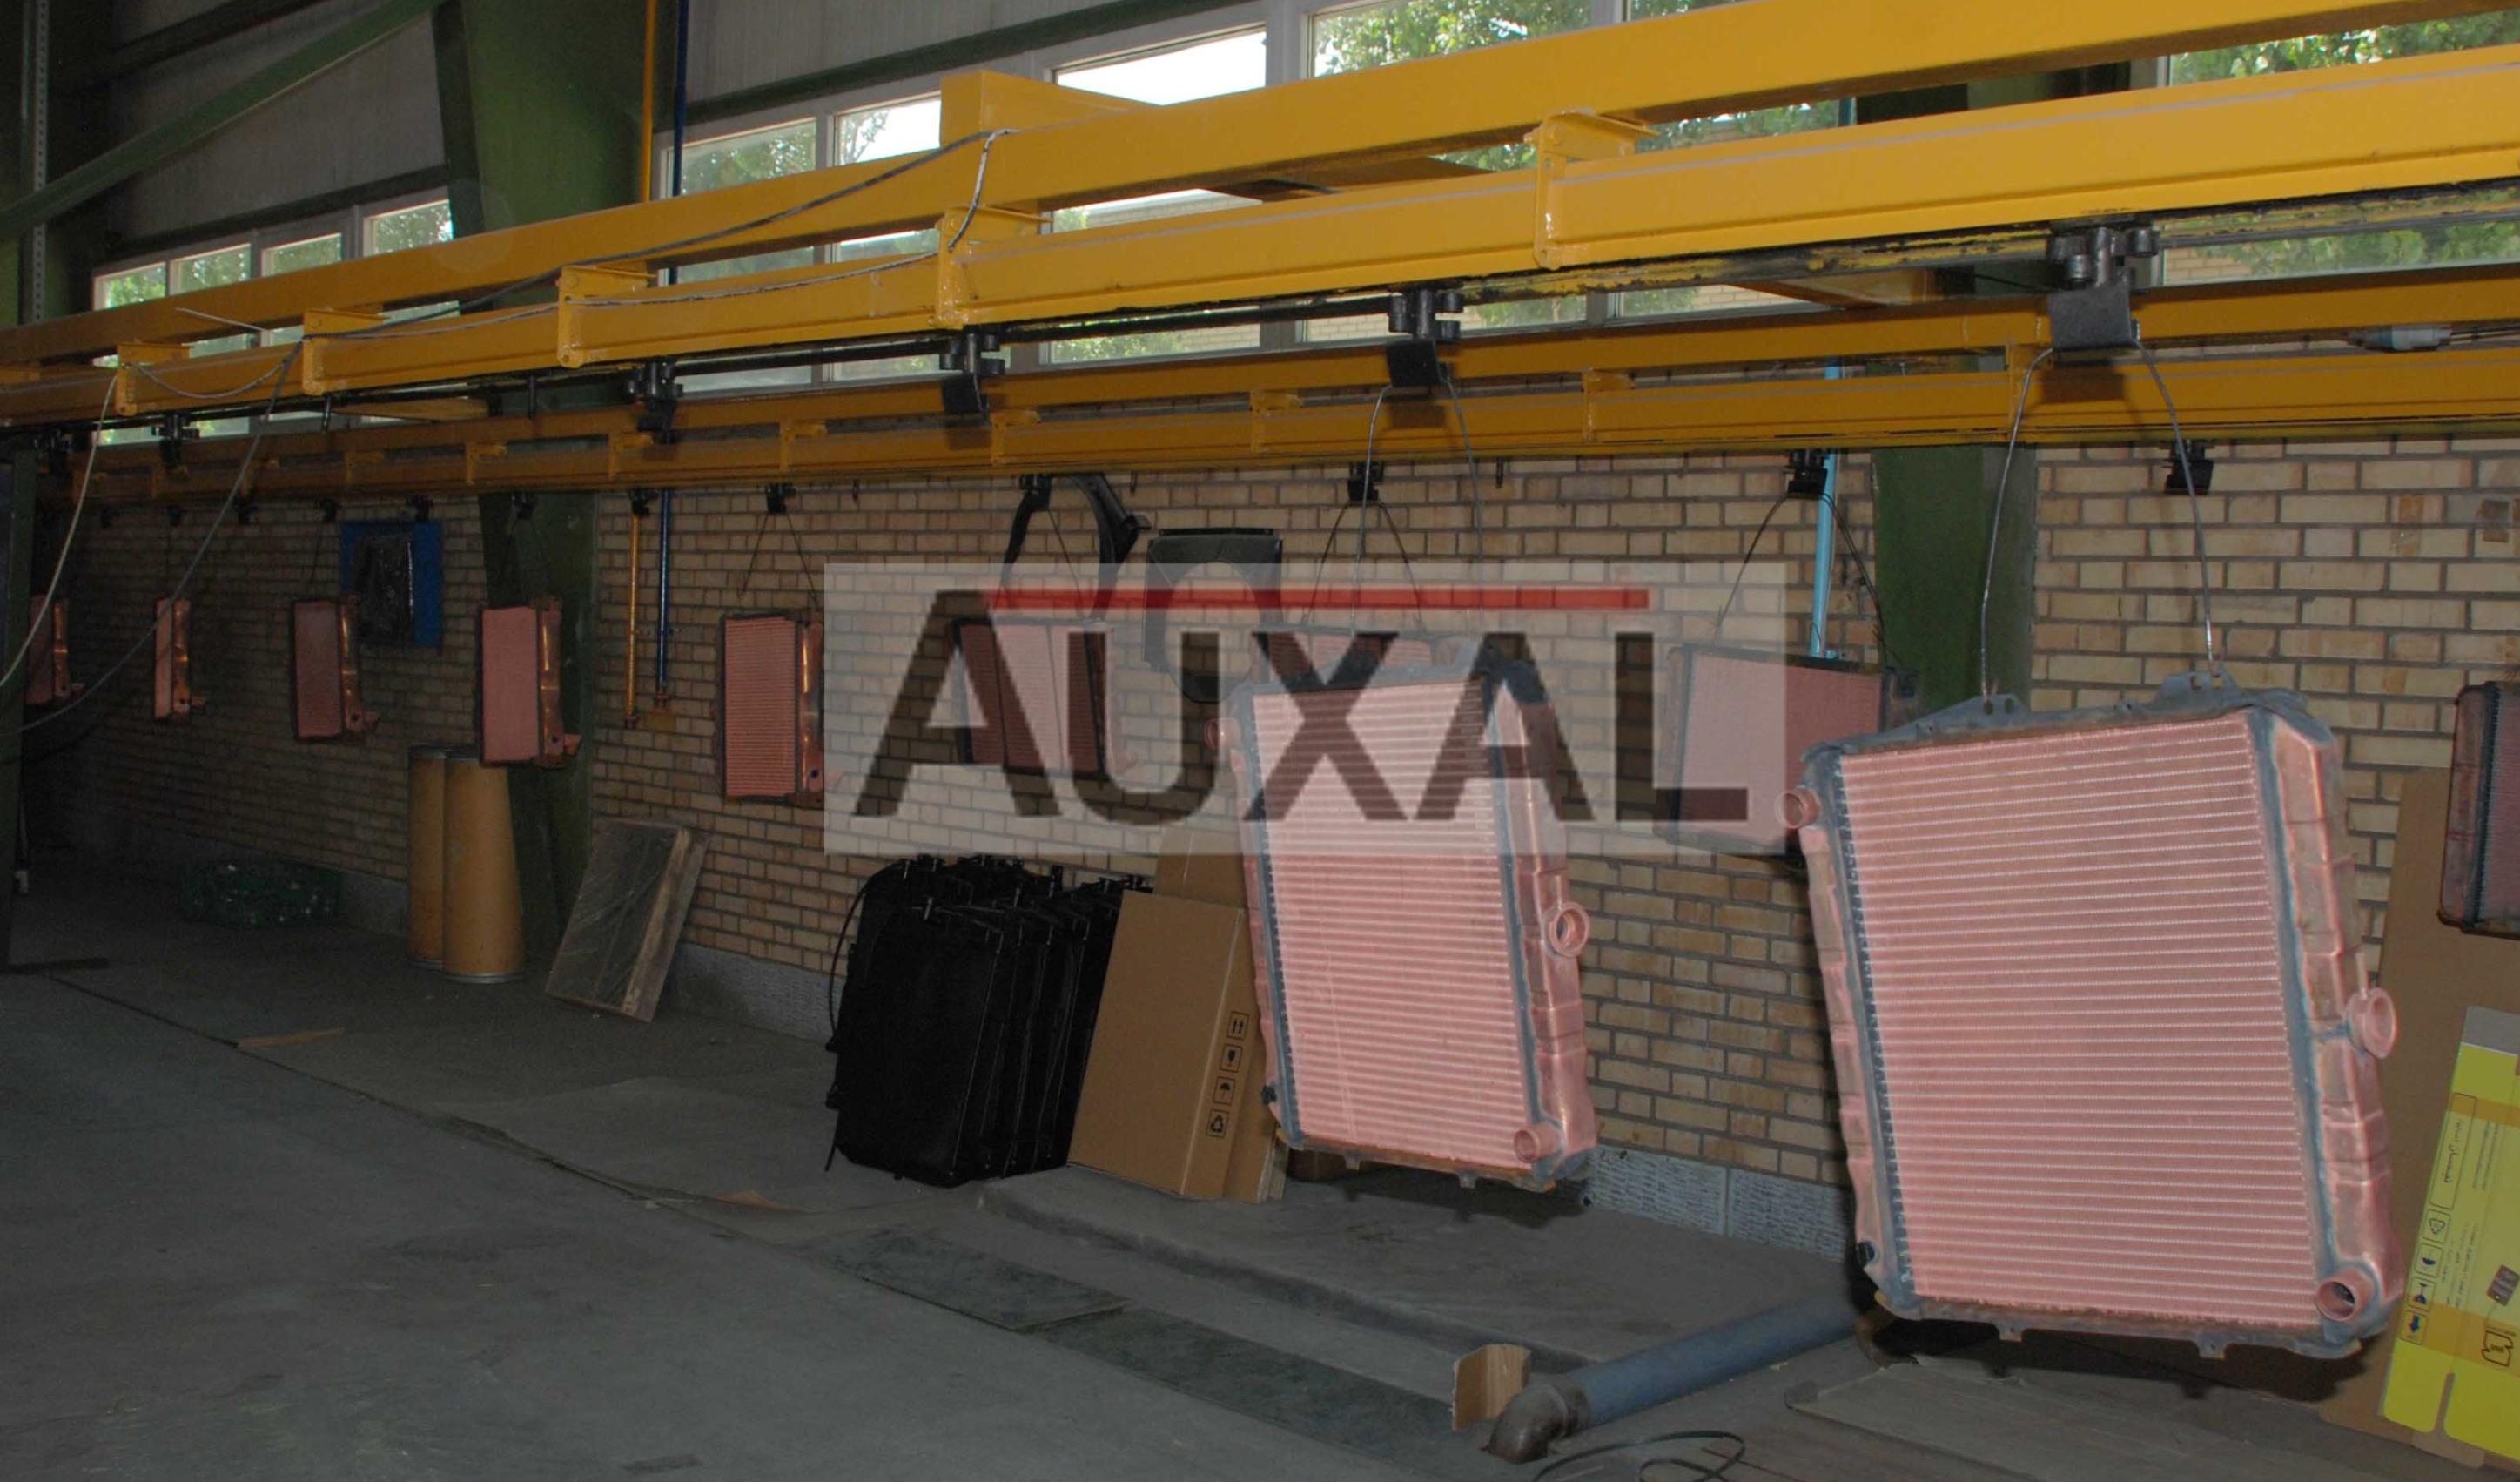 fabrication-radiateur-cuivre-auxal